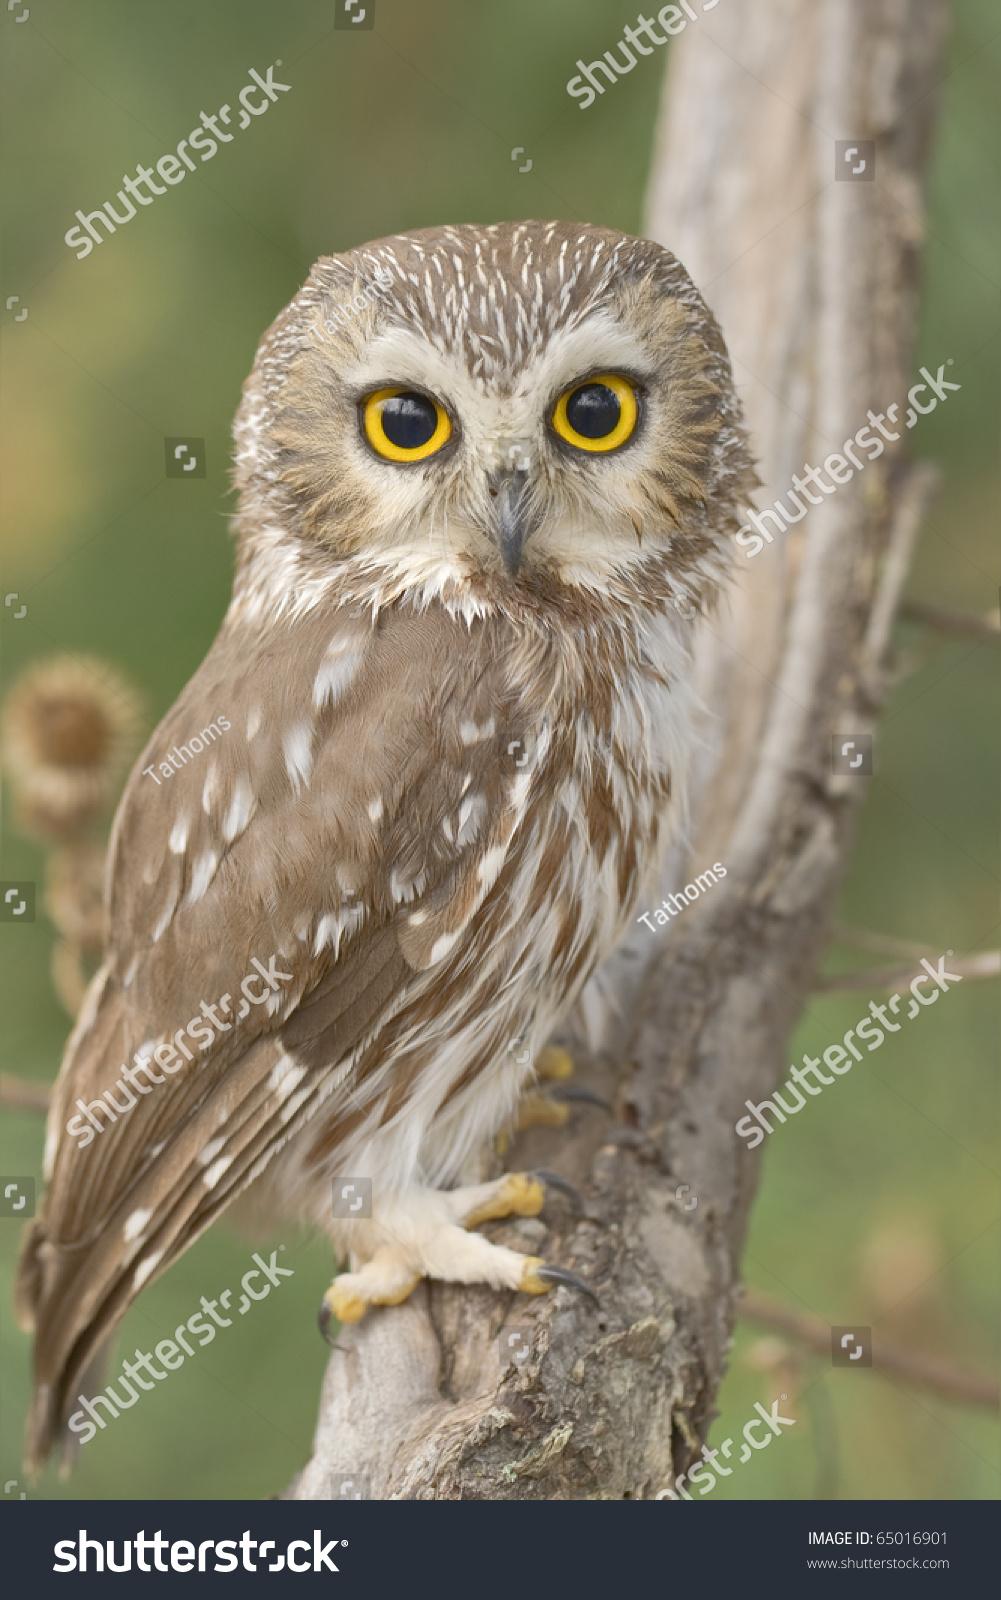 stock-photo--northern-saw-whet-owl-one-o